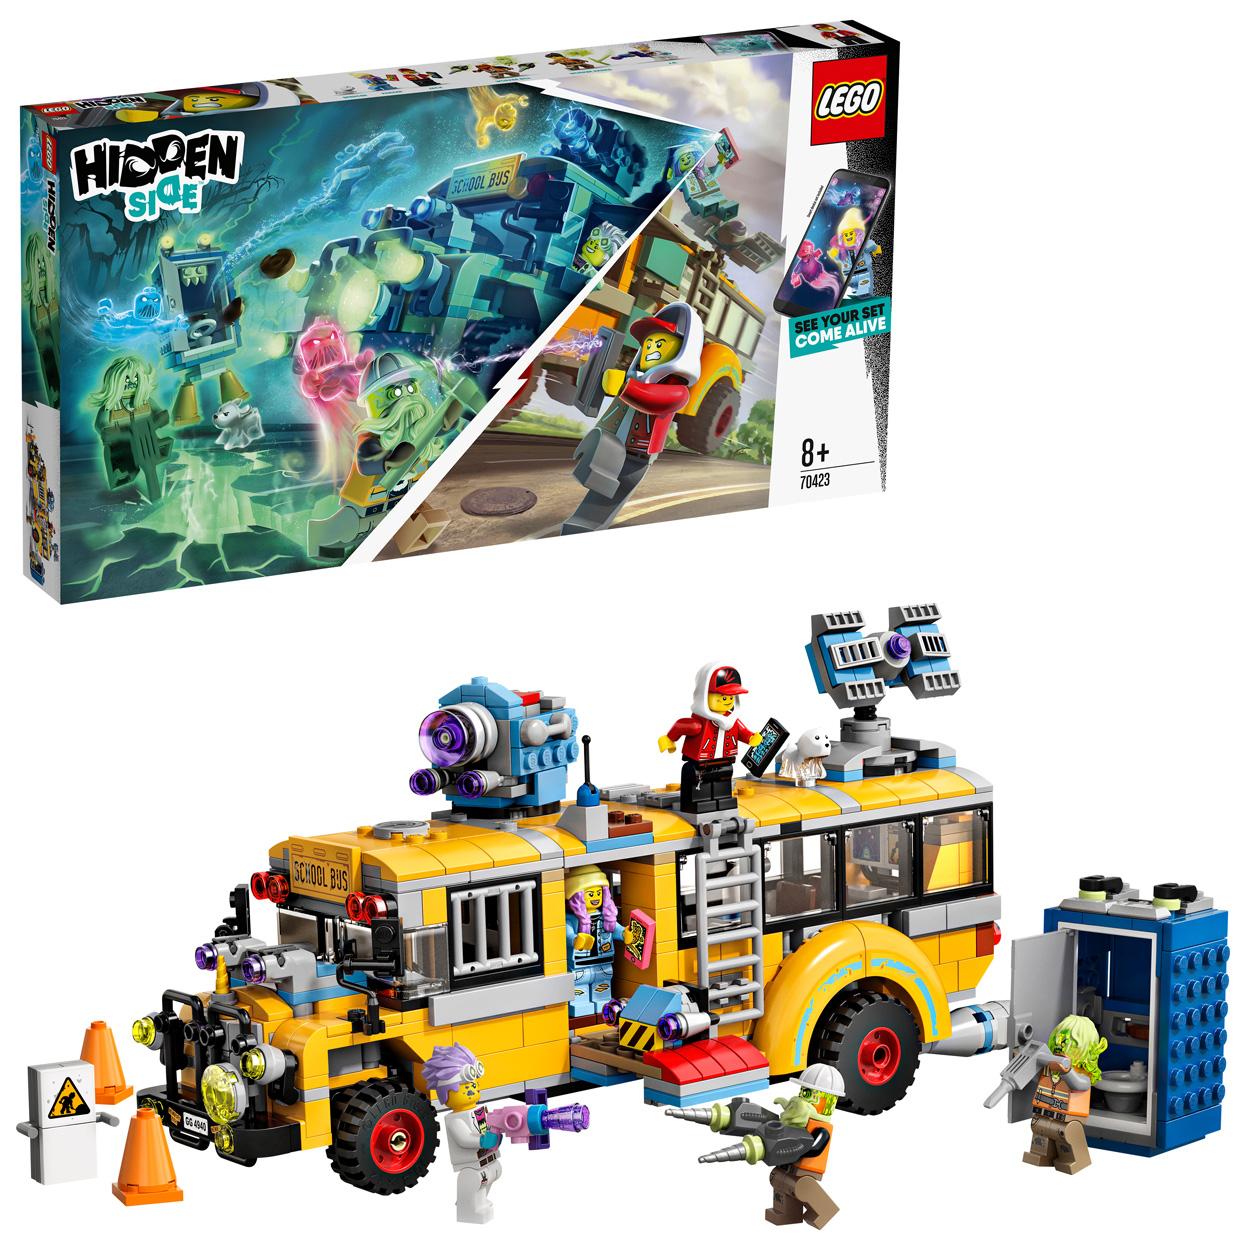 Le bus scolaire paranormal - LEGO Hidden Side - 70423